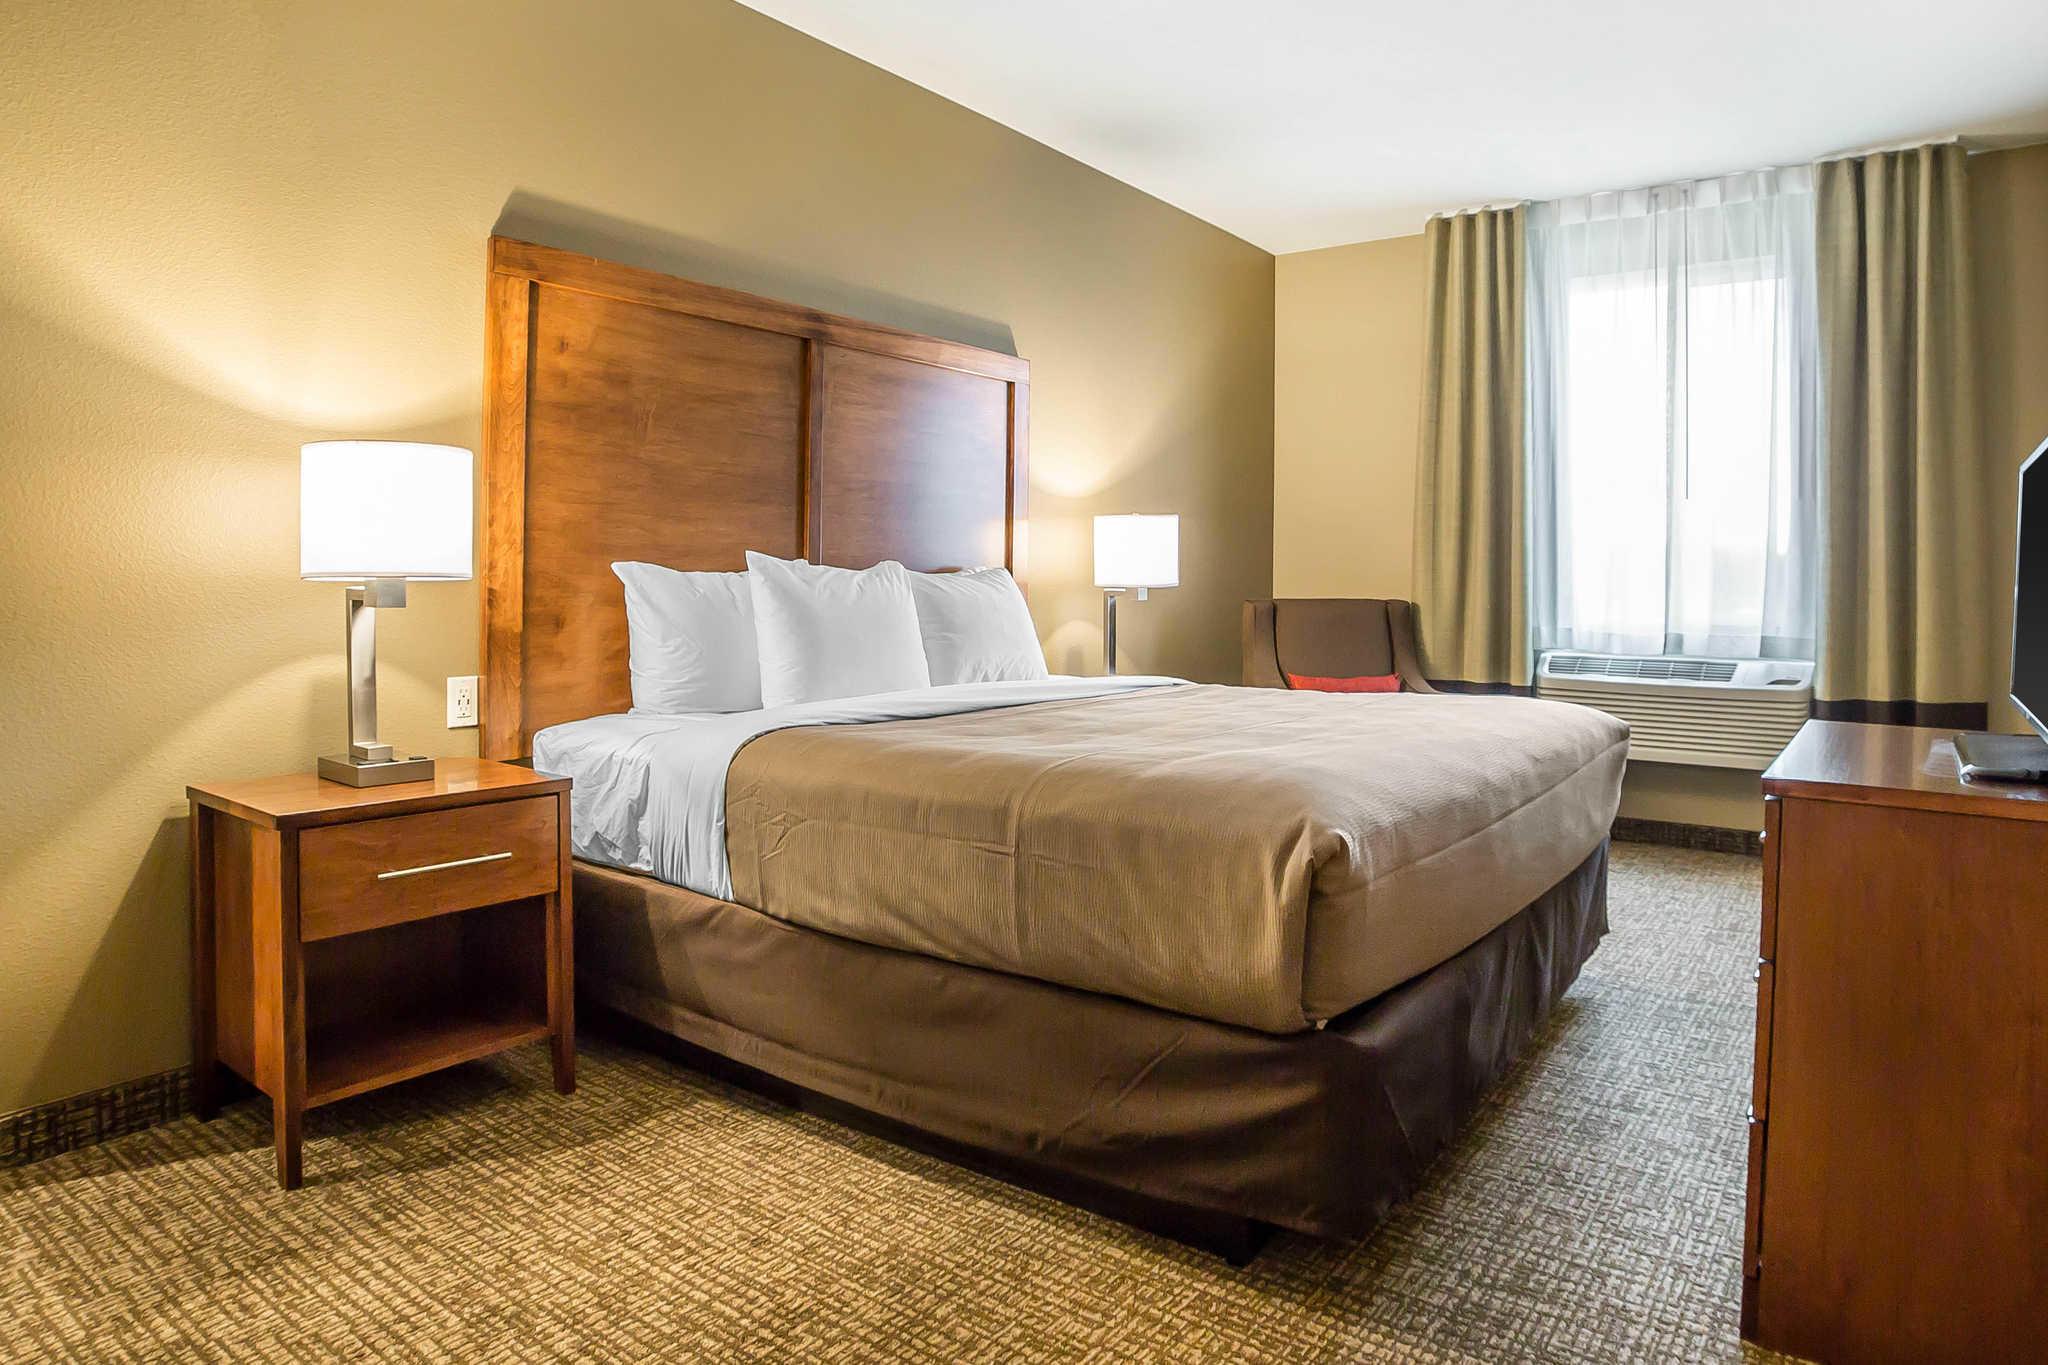 Comfort Inn & Suites Near Mt. Rushmore image 22